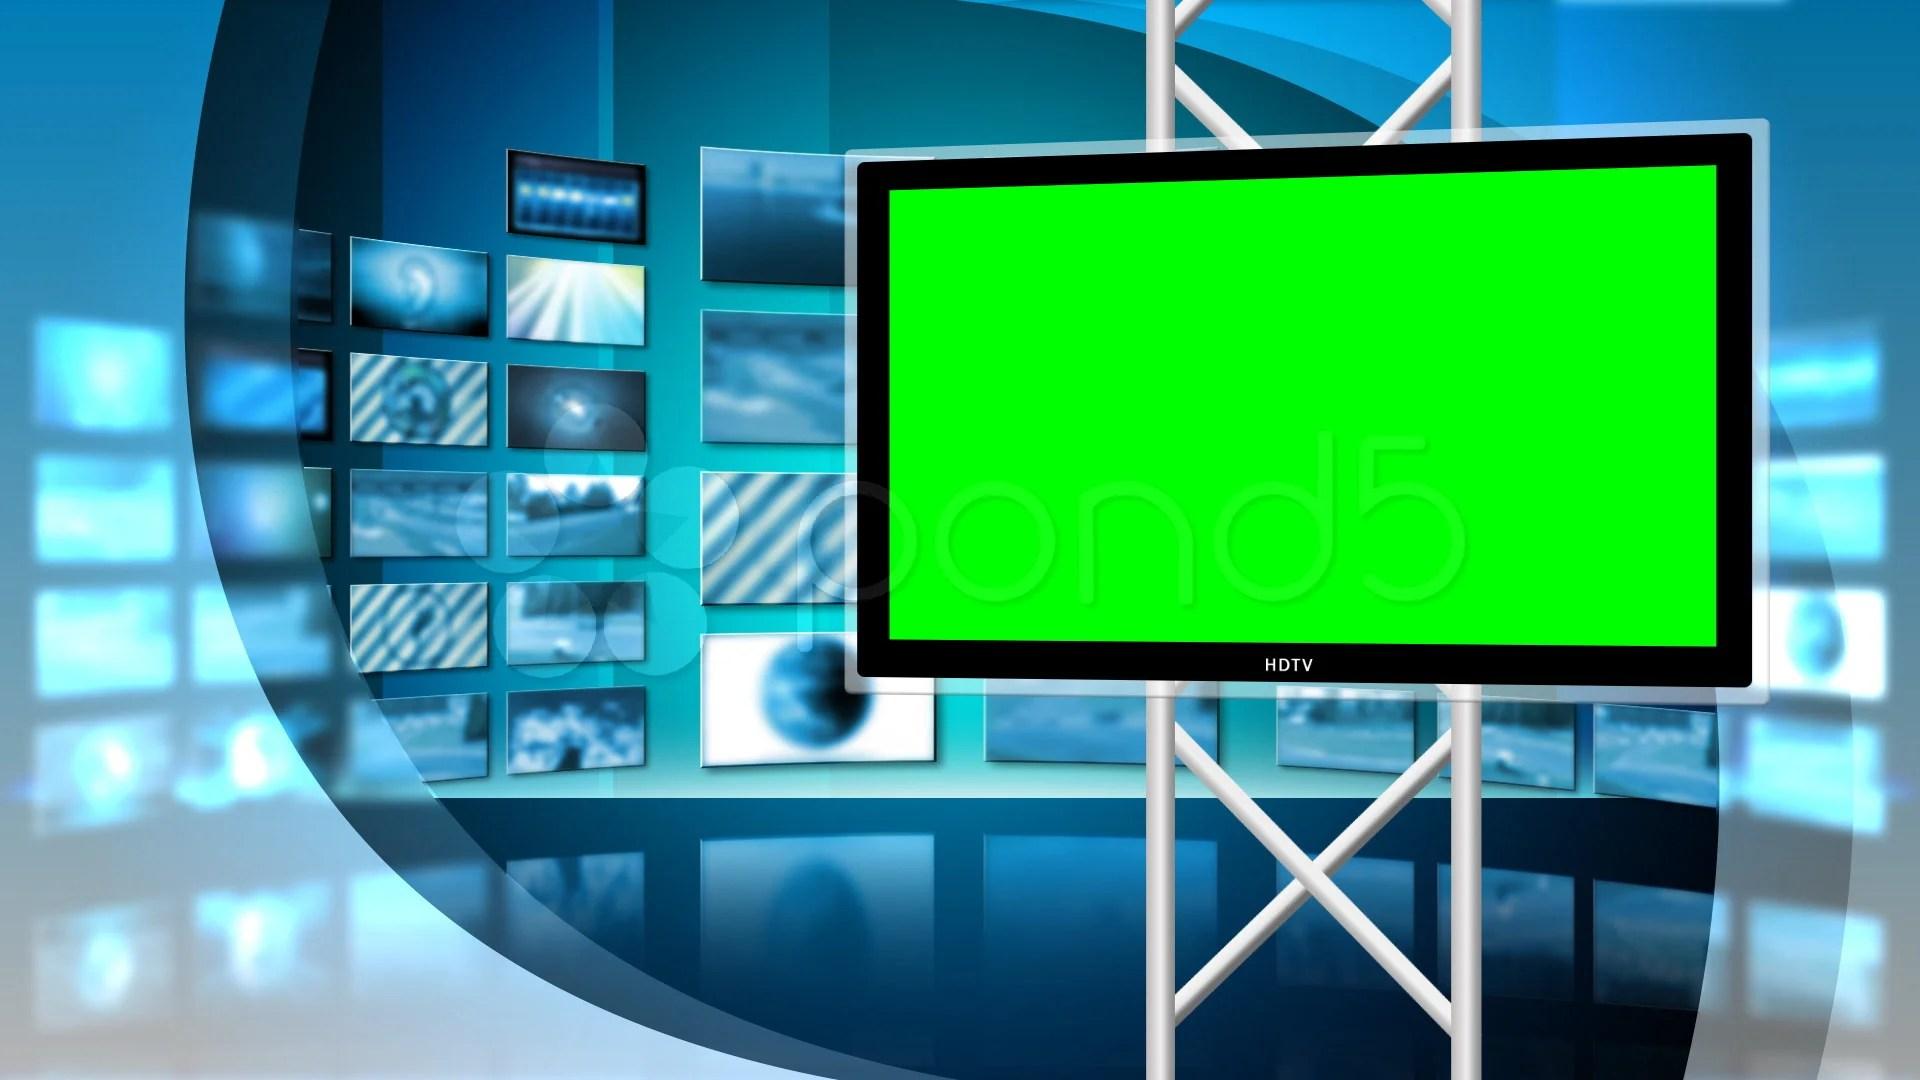 Animated 3d Wallpaper Gifs Looping Virtual News Studio 8 Loop Video Clip 716682 Pond5